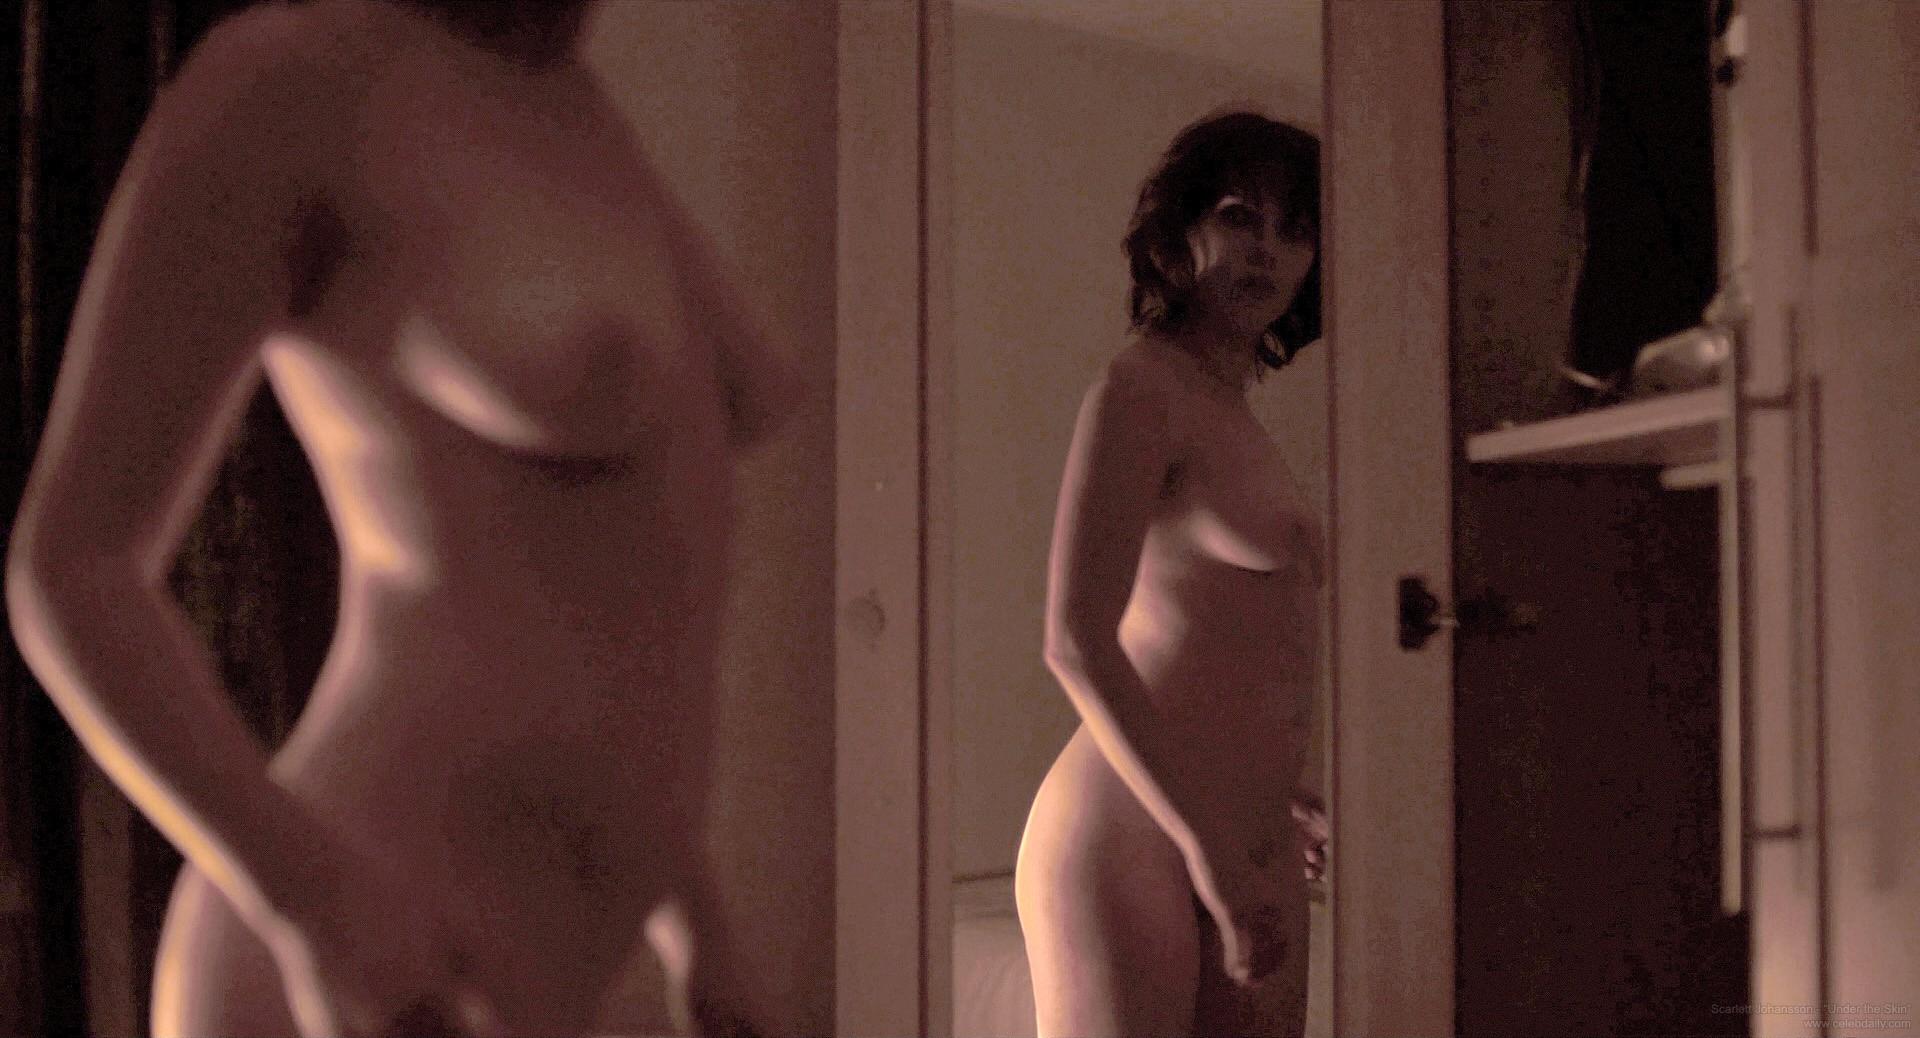 Gay male celebrities nude picture scenes